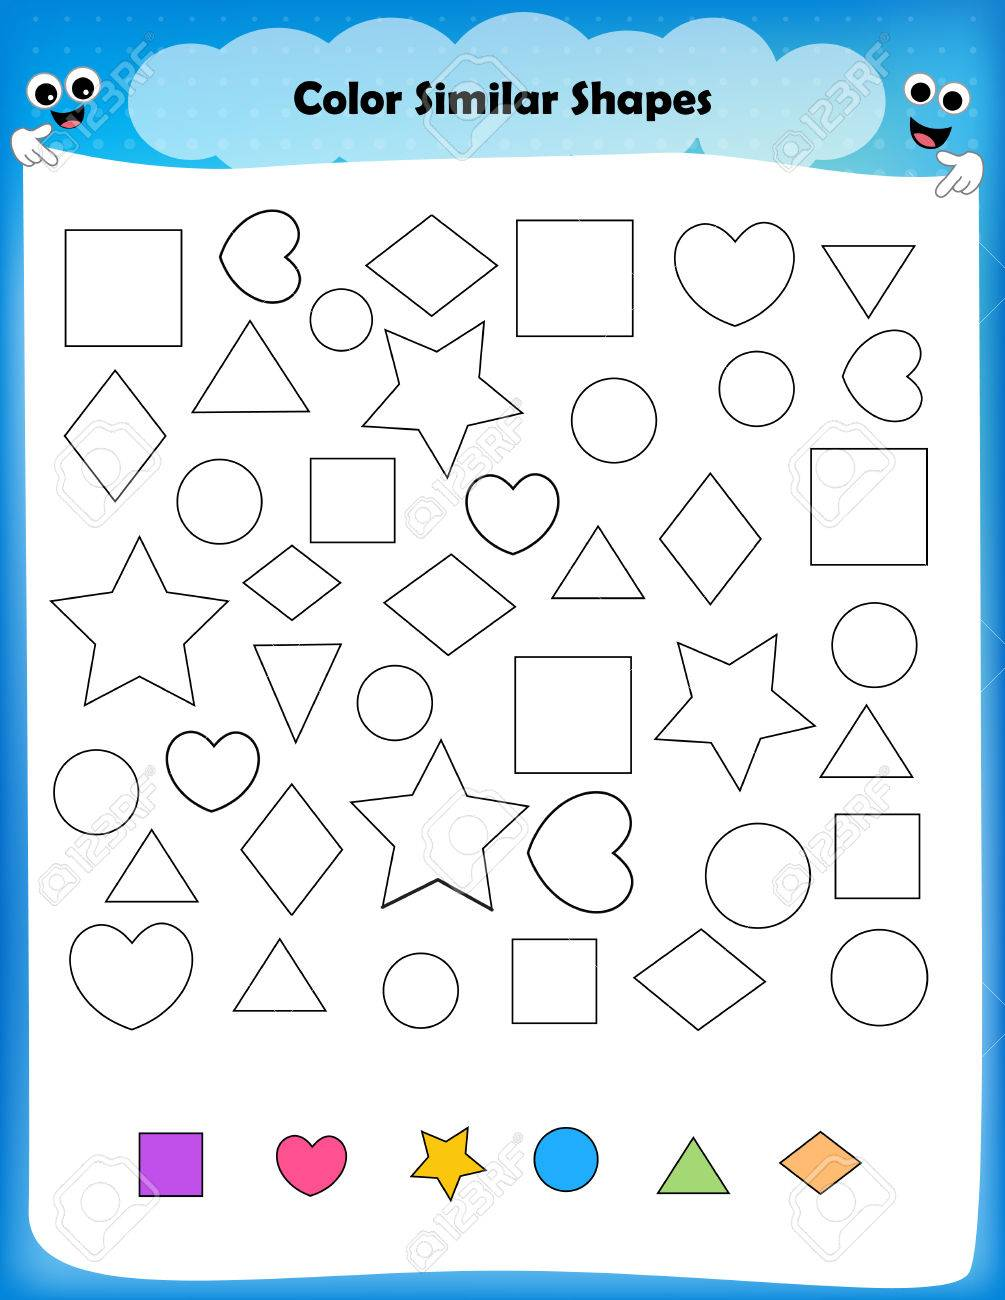 worksheet Preschool Pattern Worksheets worksheet color similar shapes for preschool kids stock vector 68974179